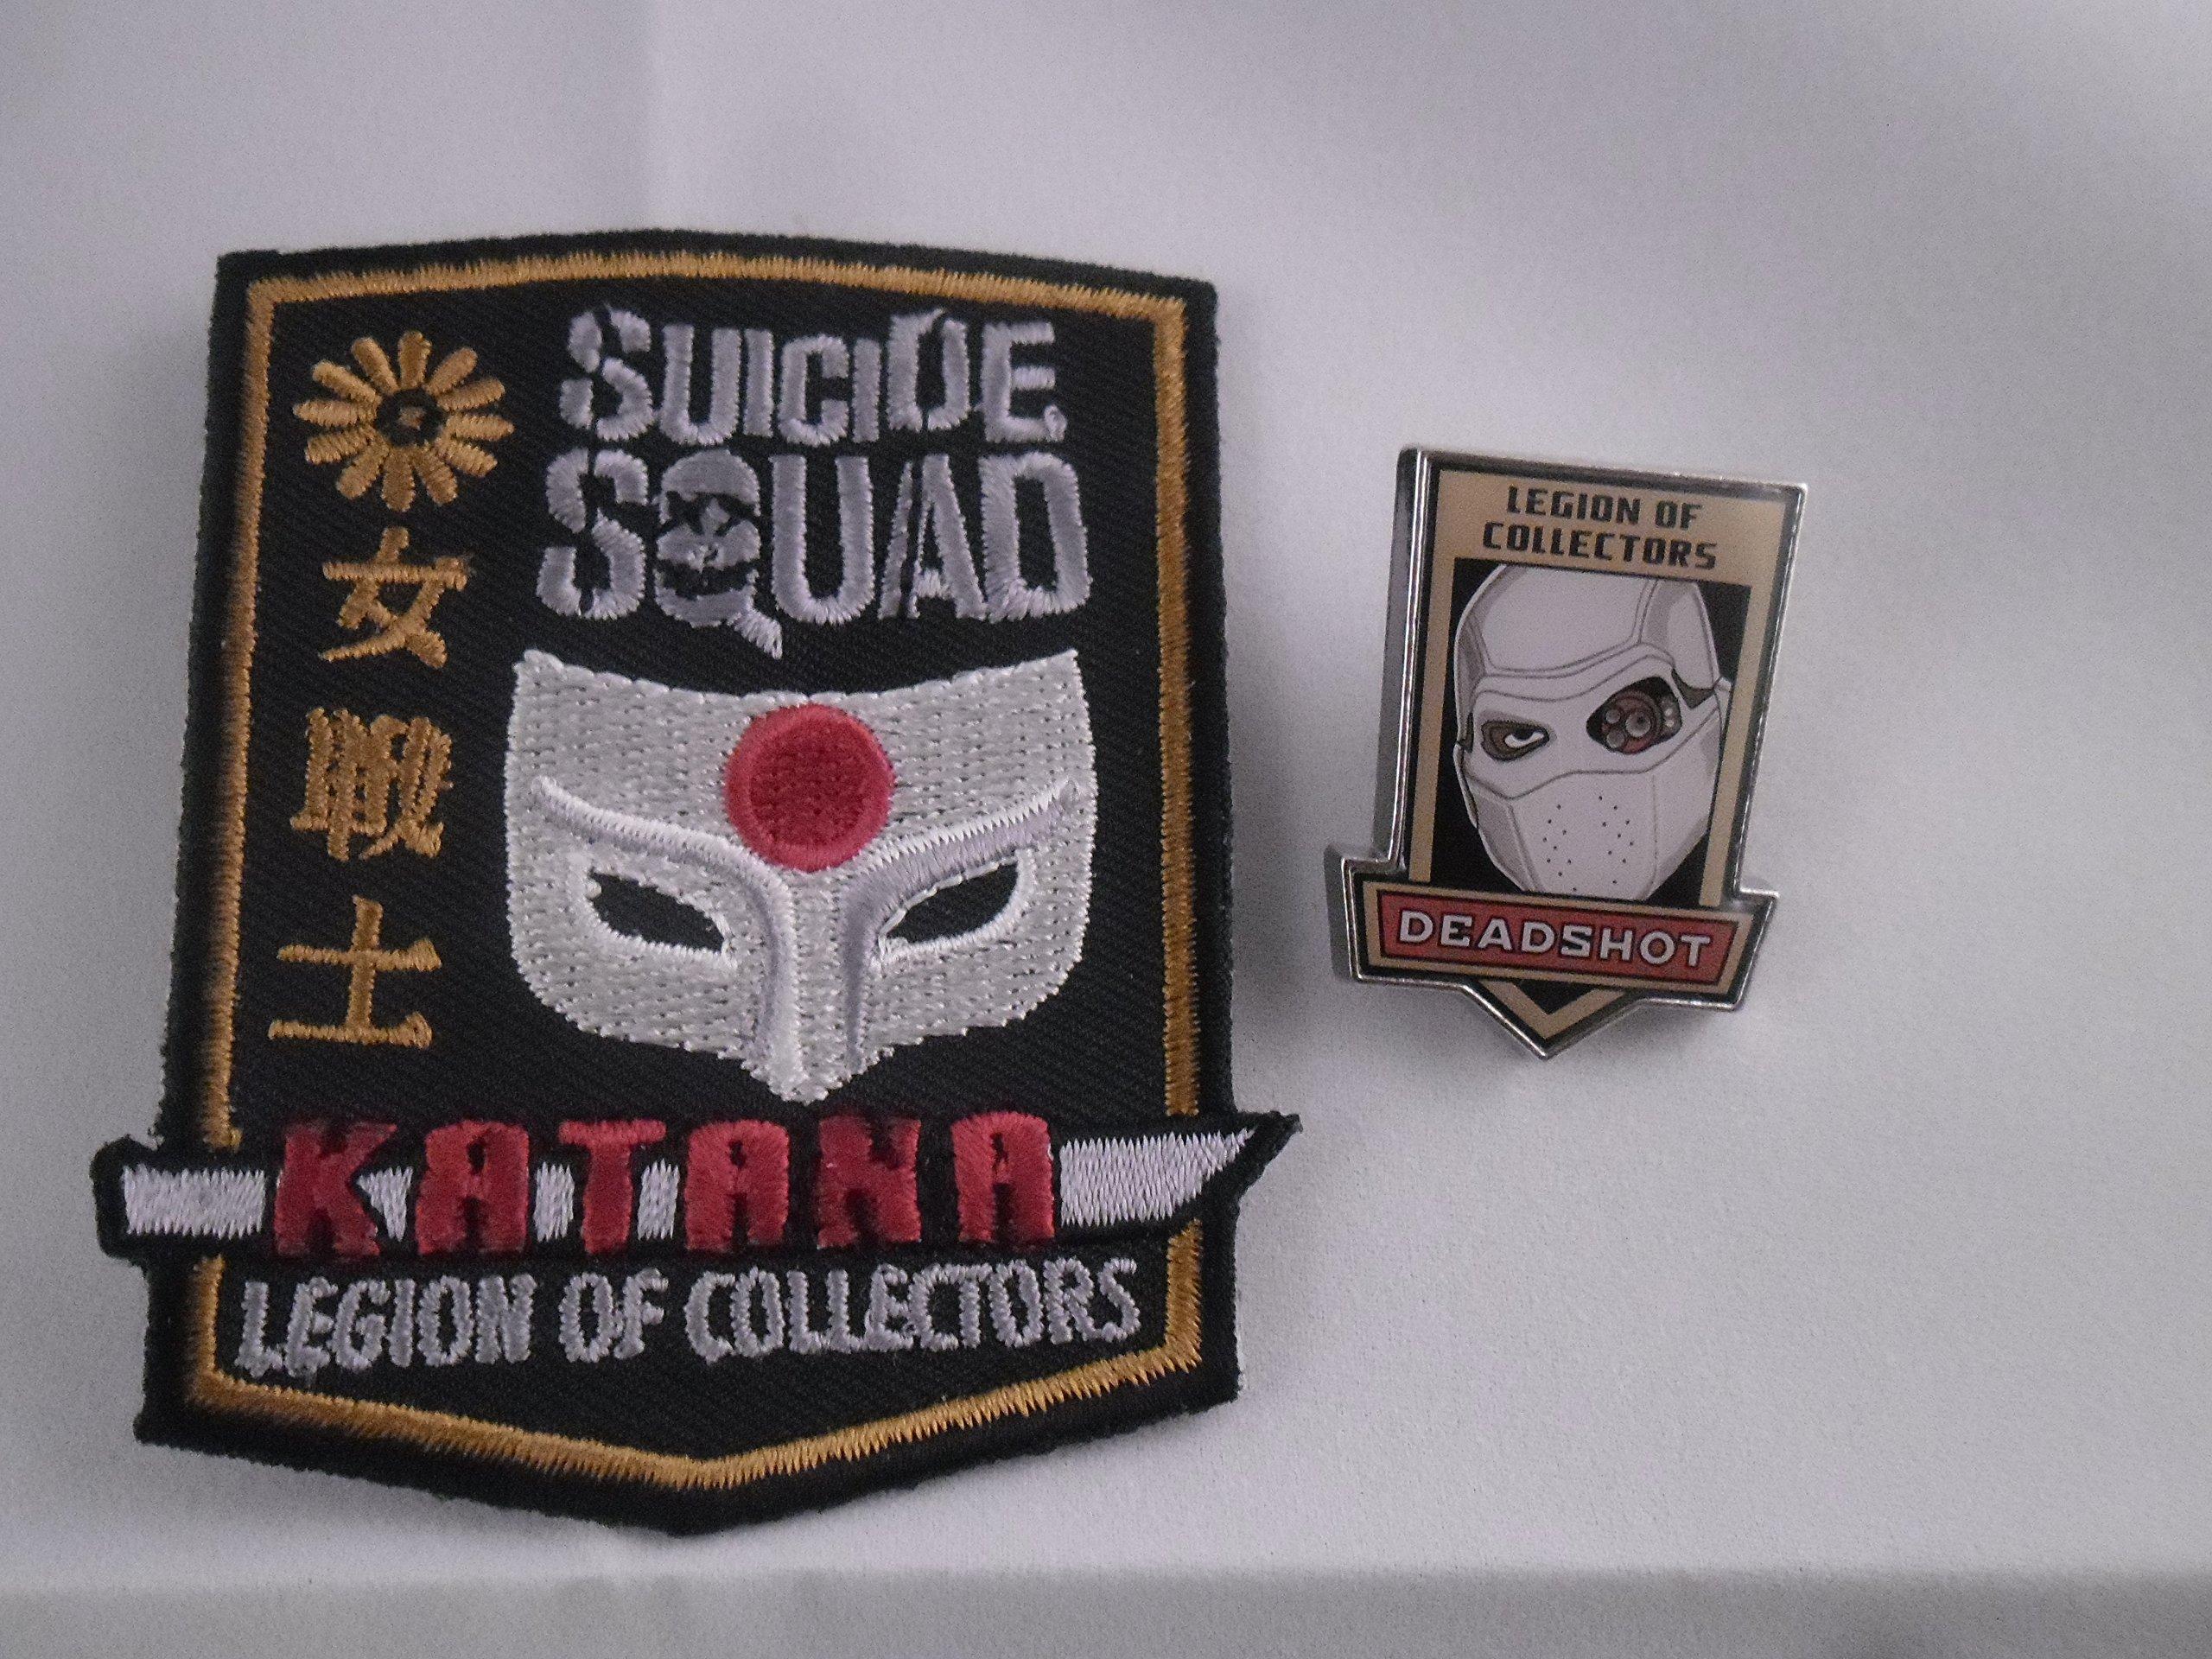 Suicide Squad Katana Patch + Deadshot Pin